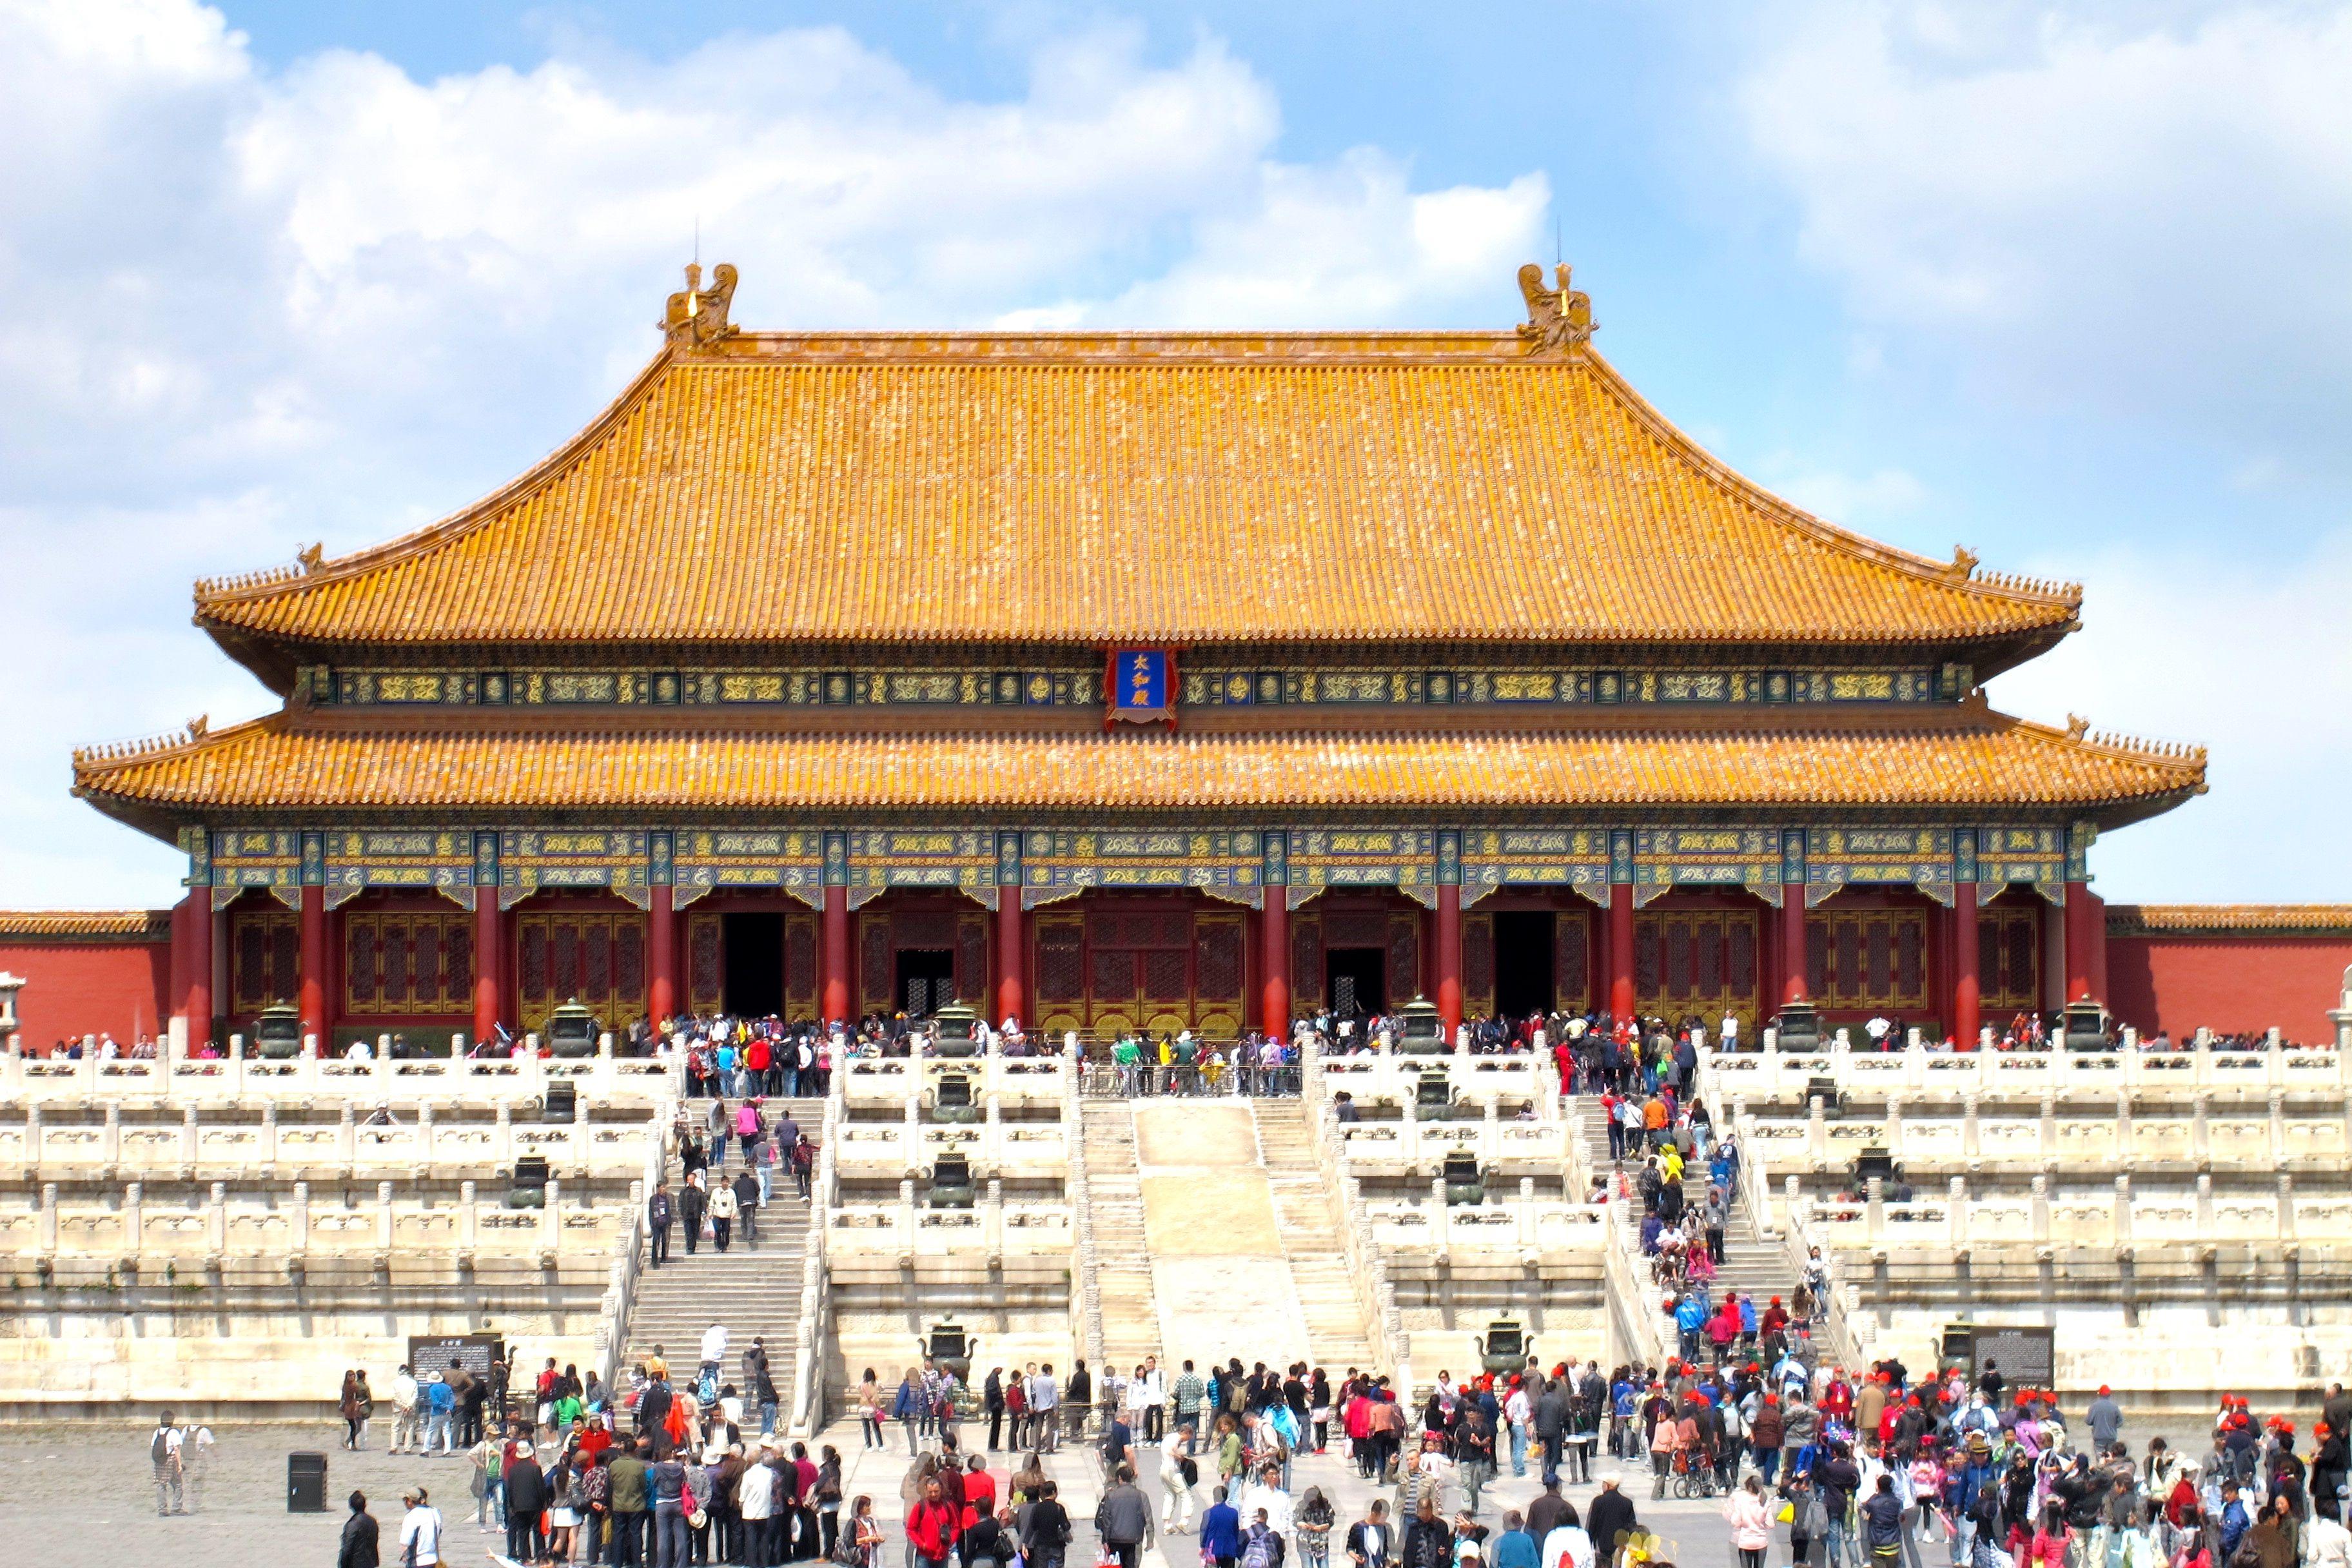 Forbidden City - Imperial Palace Beijing, China - e-architect  |Imperial Palace Forbidden City Beijing China